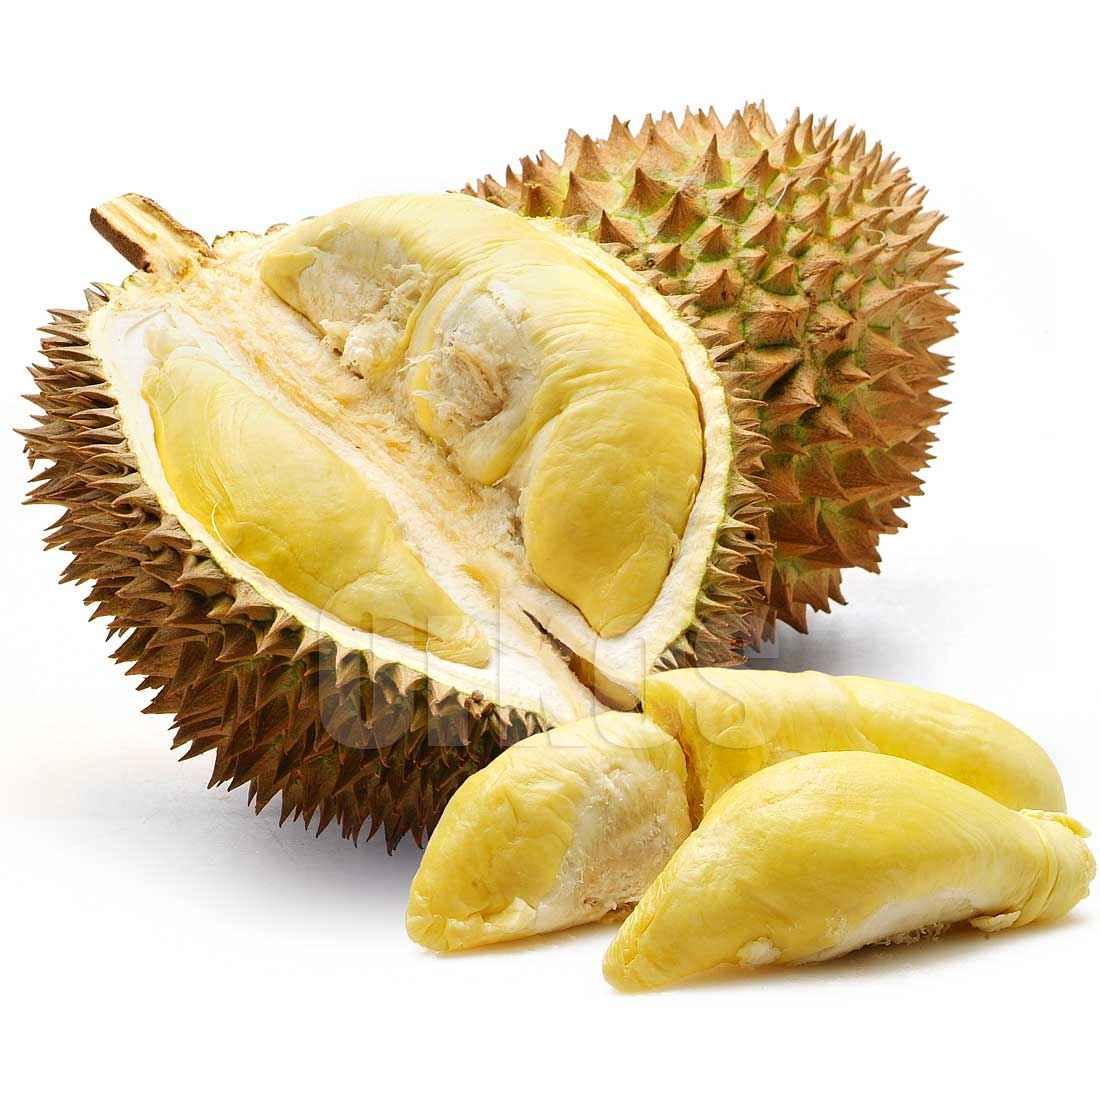 Varietas Durian Unggul